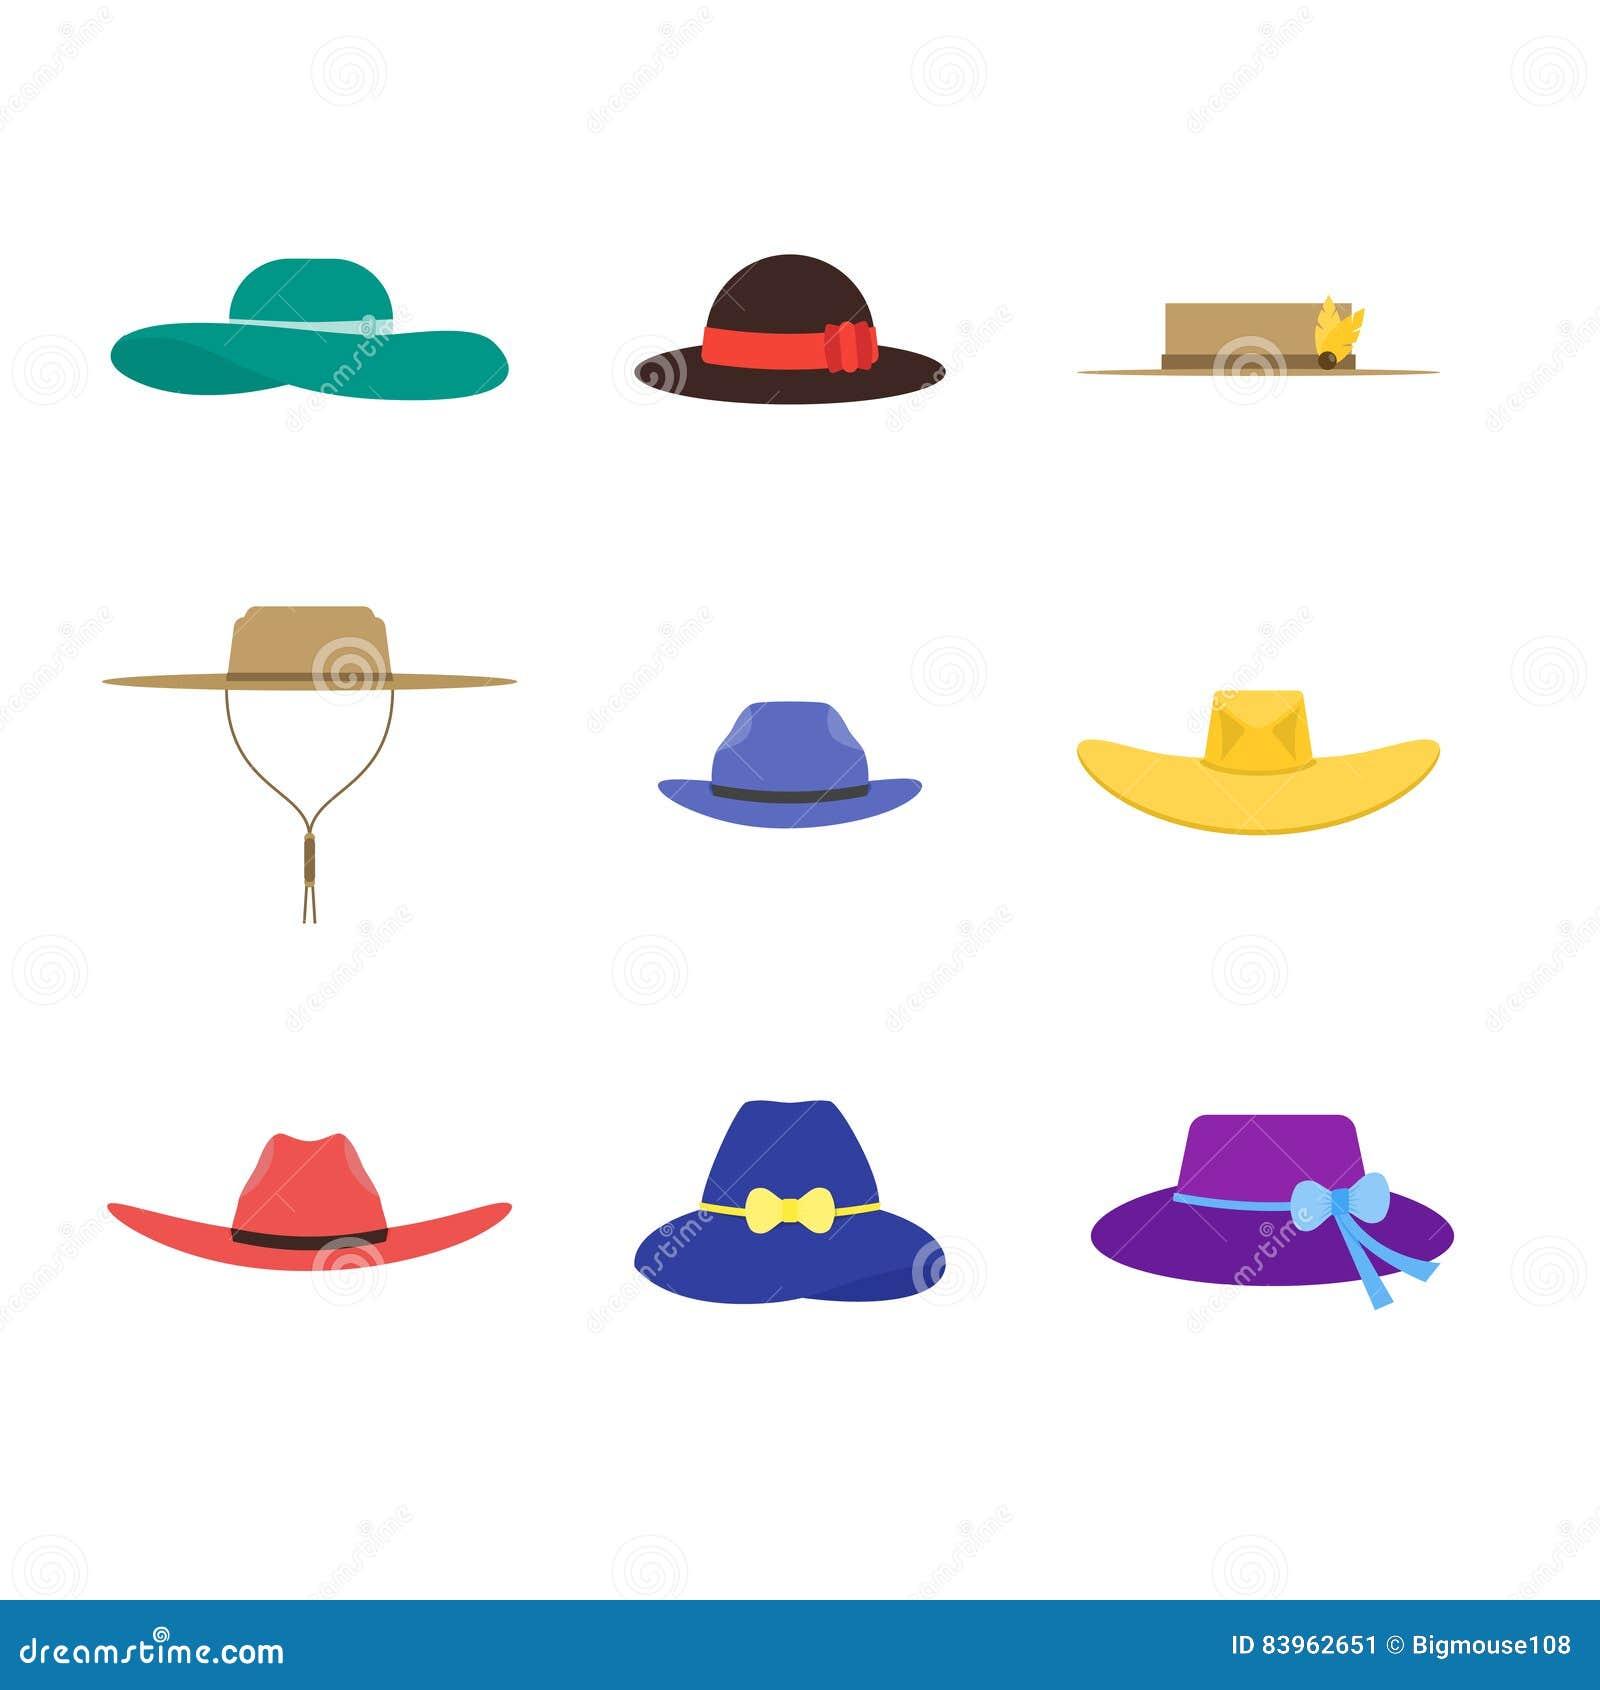 5660dd74bf373 Cartoon Color Hats Set Fashion for Men and Women Flat Design Style Personal  Seasonal Cap. Vector illustration. More similar stock illustrations